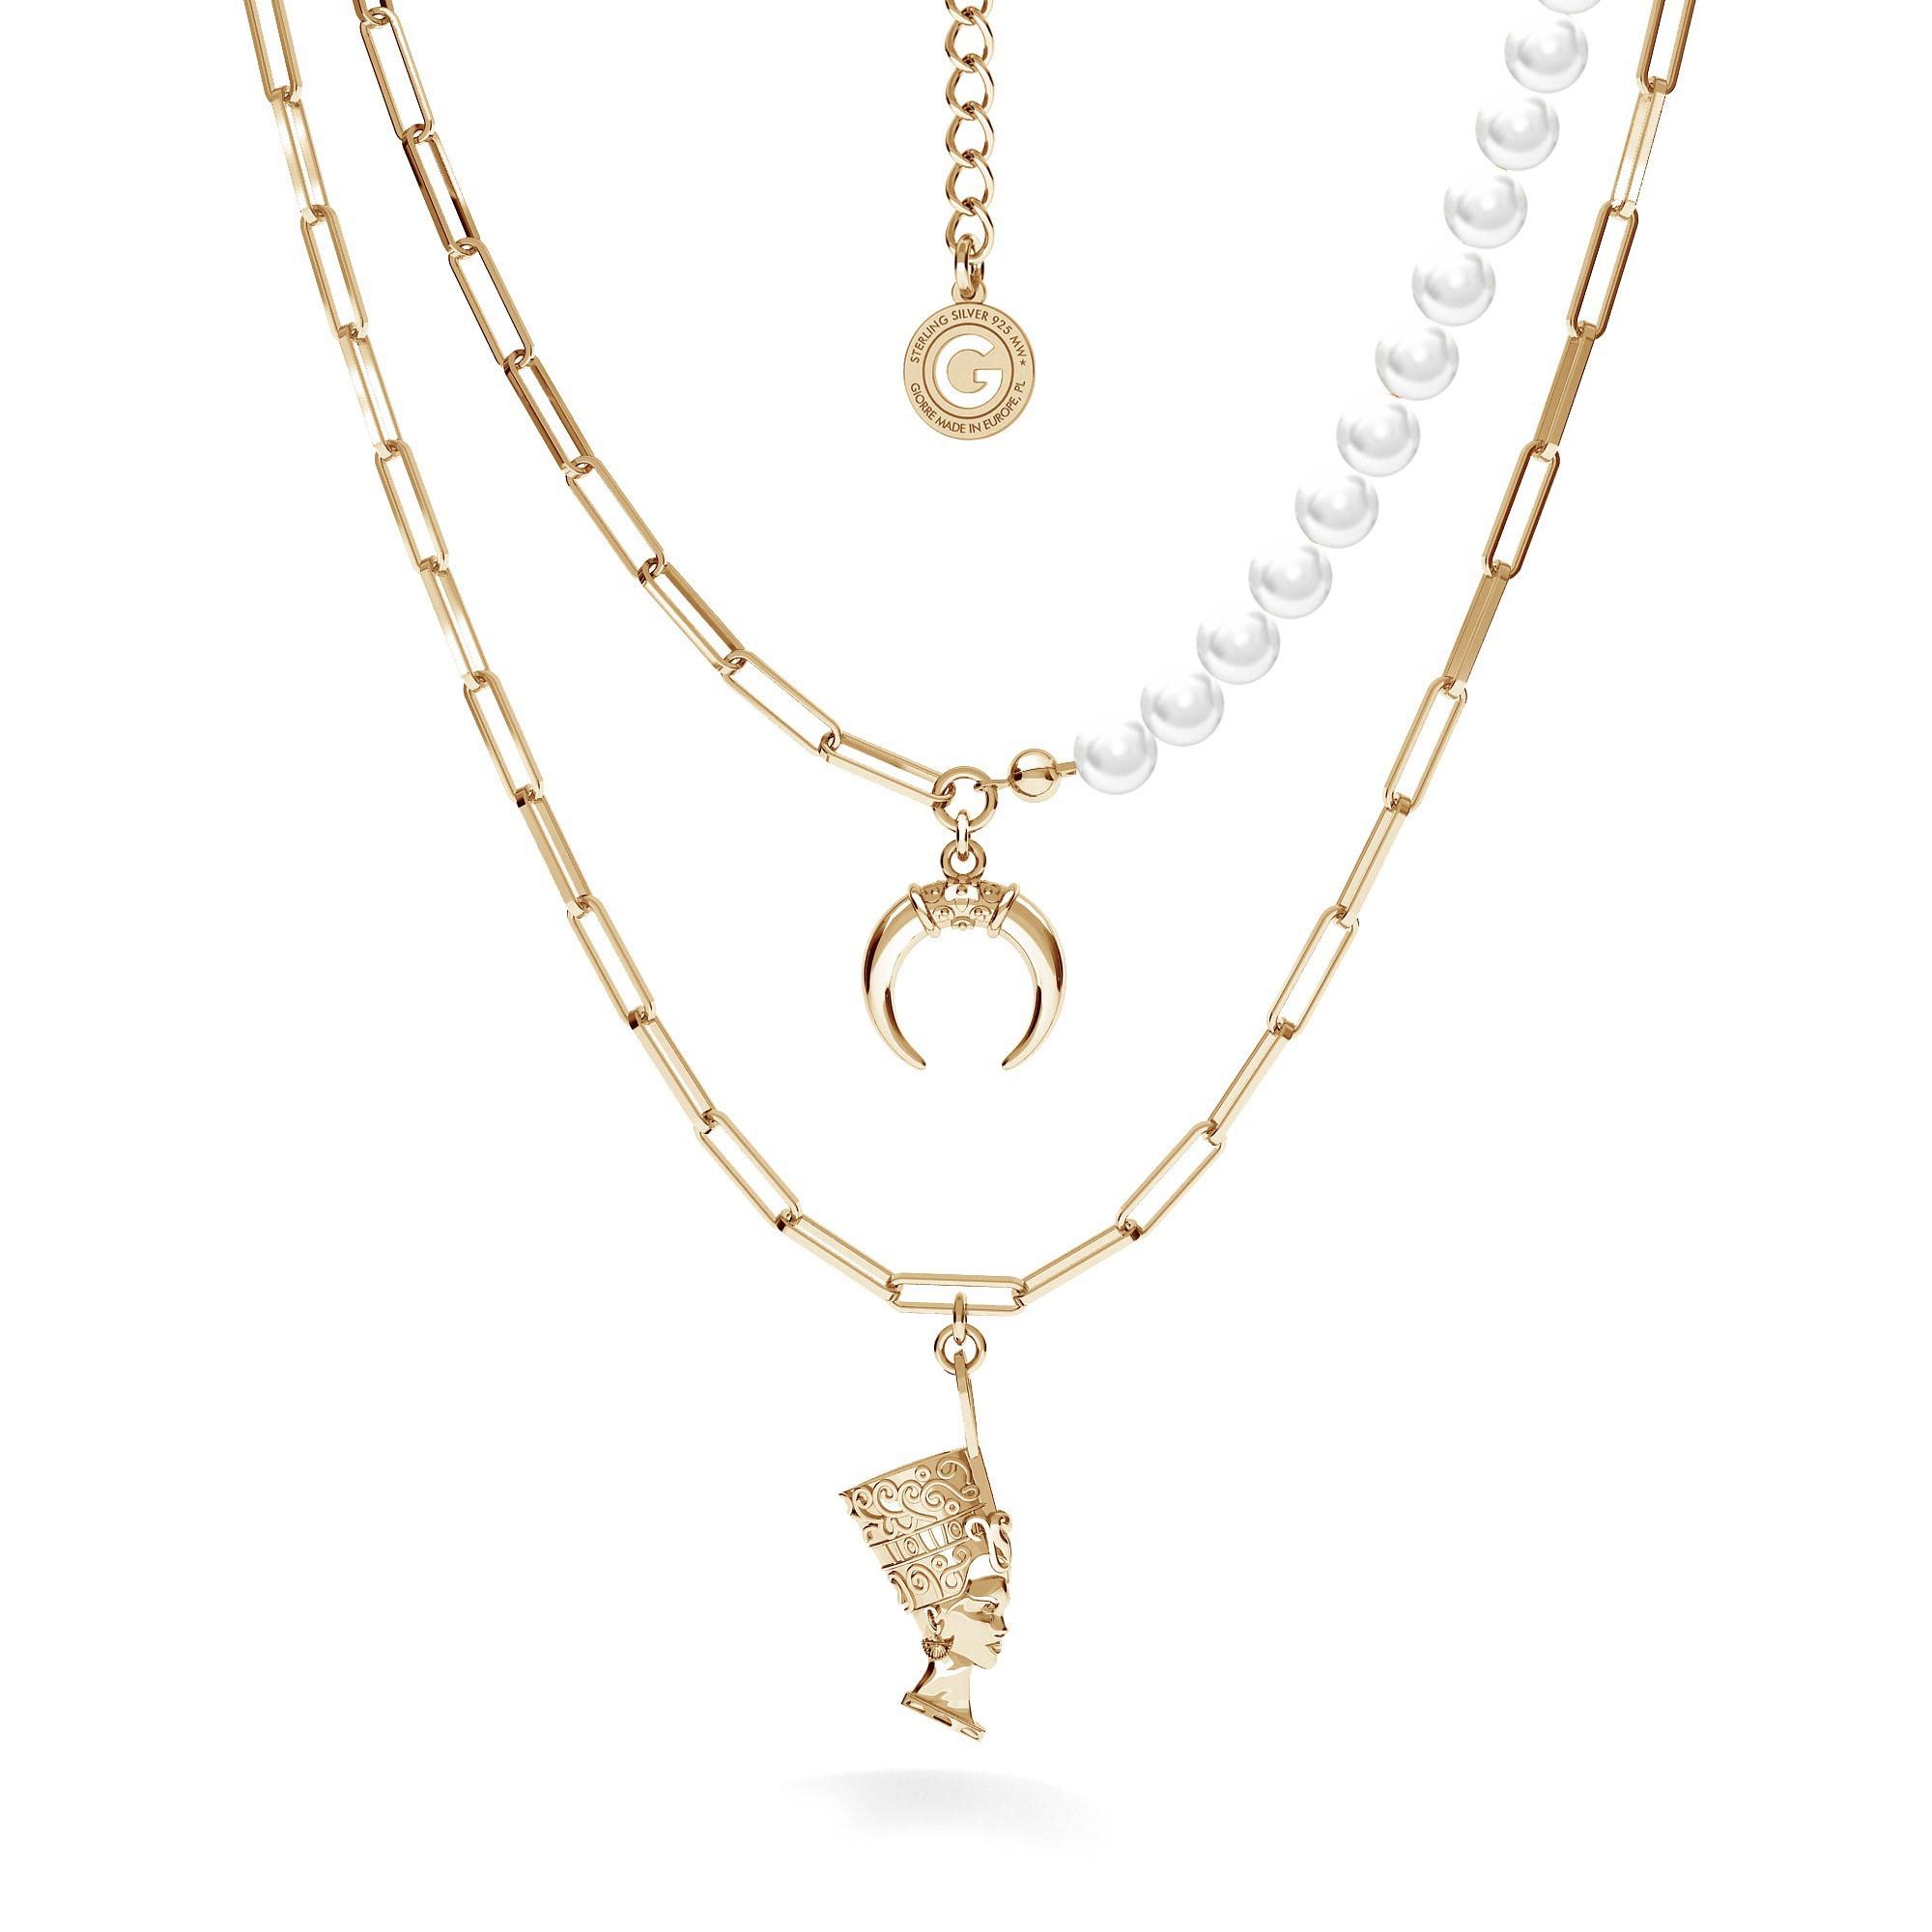 Stingray necklace, MON DÉFI, Silver 925